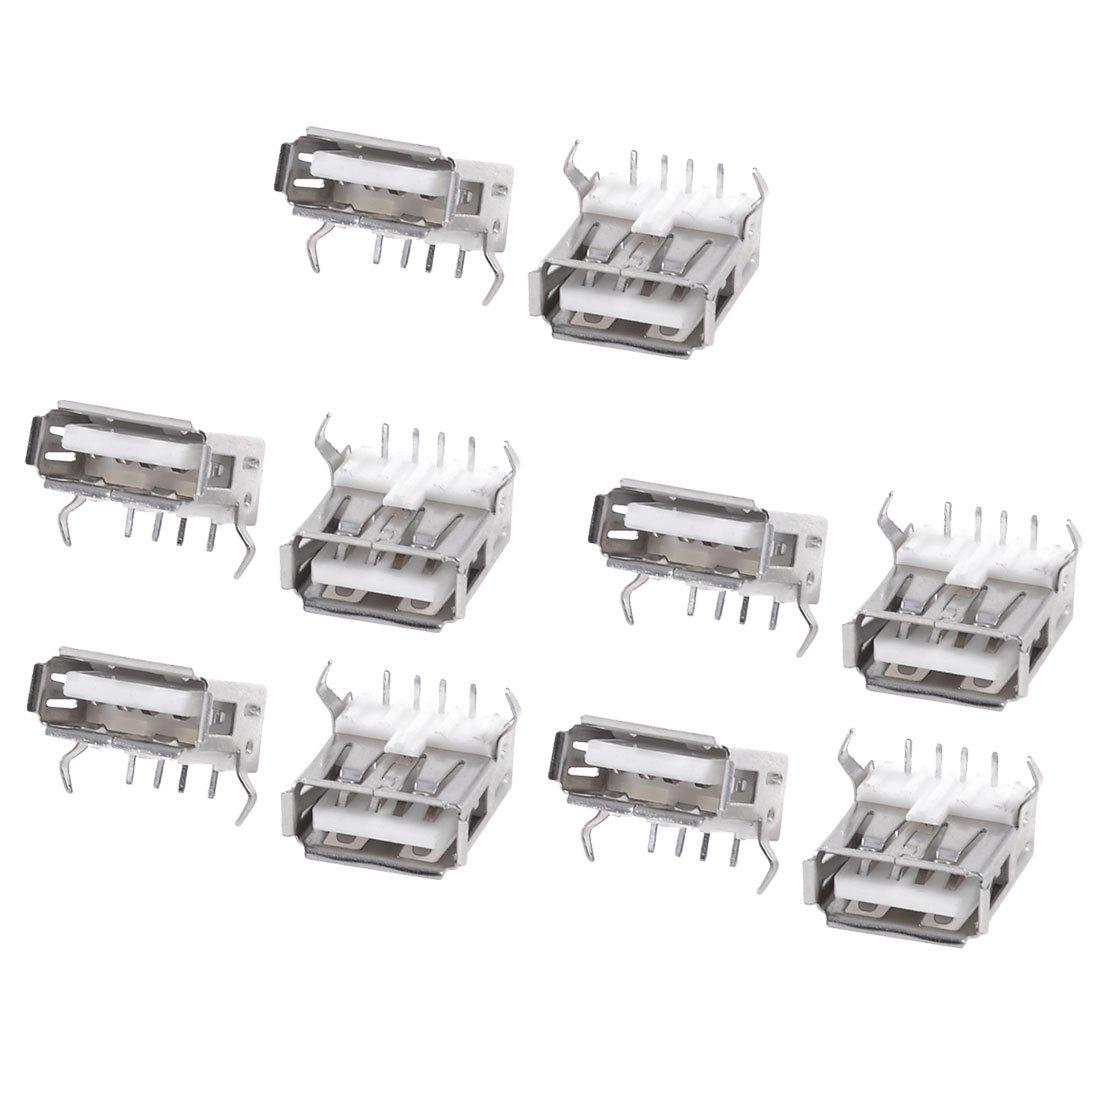 10pcs usb type a standard port female solder jacks connector b3